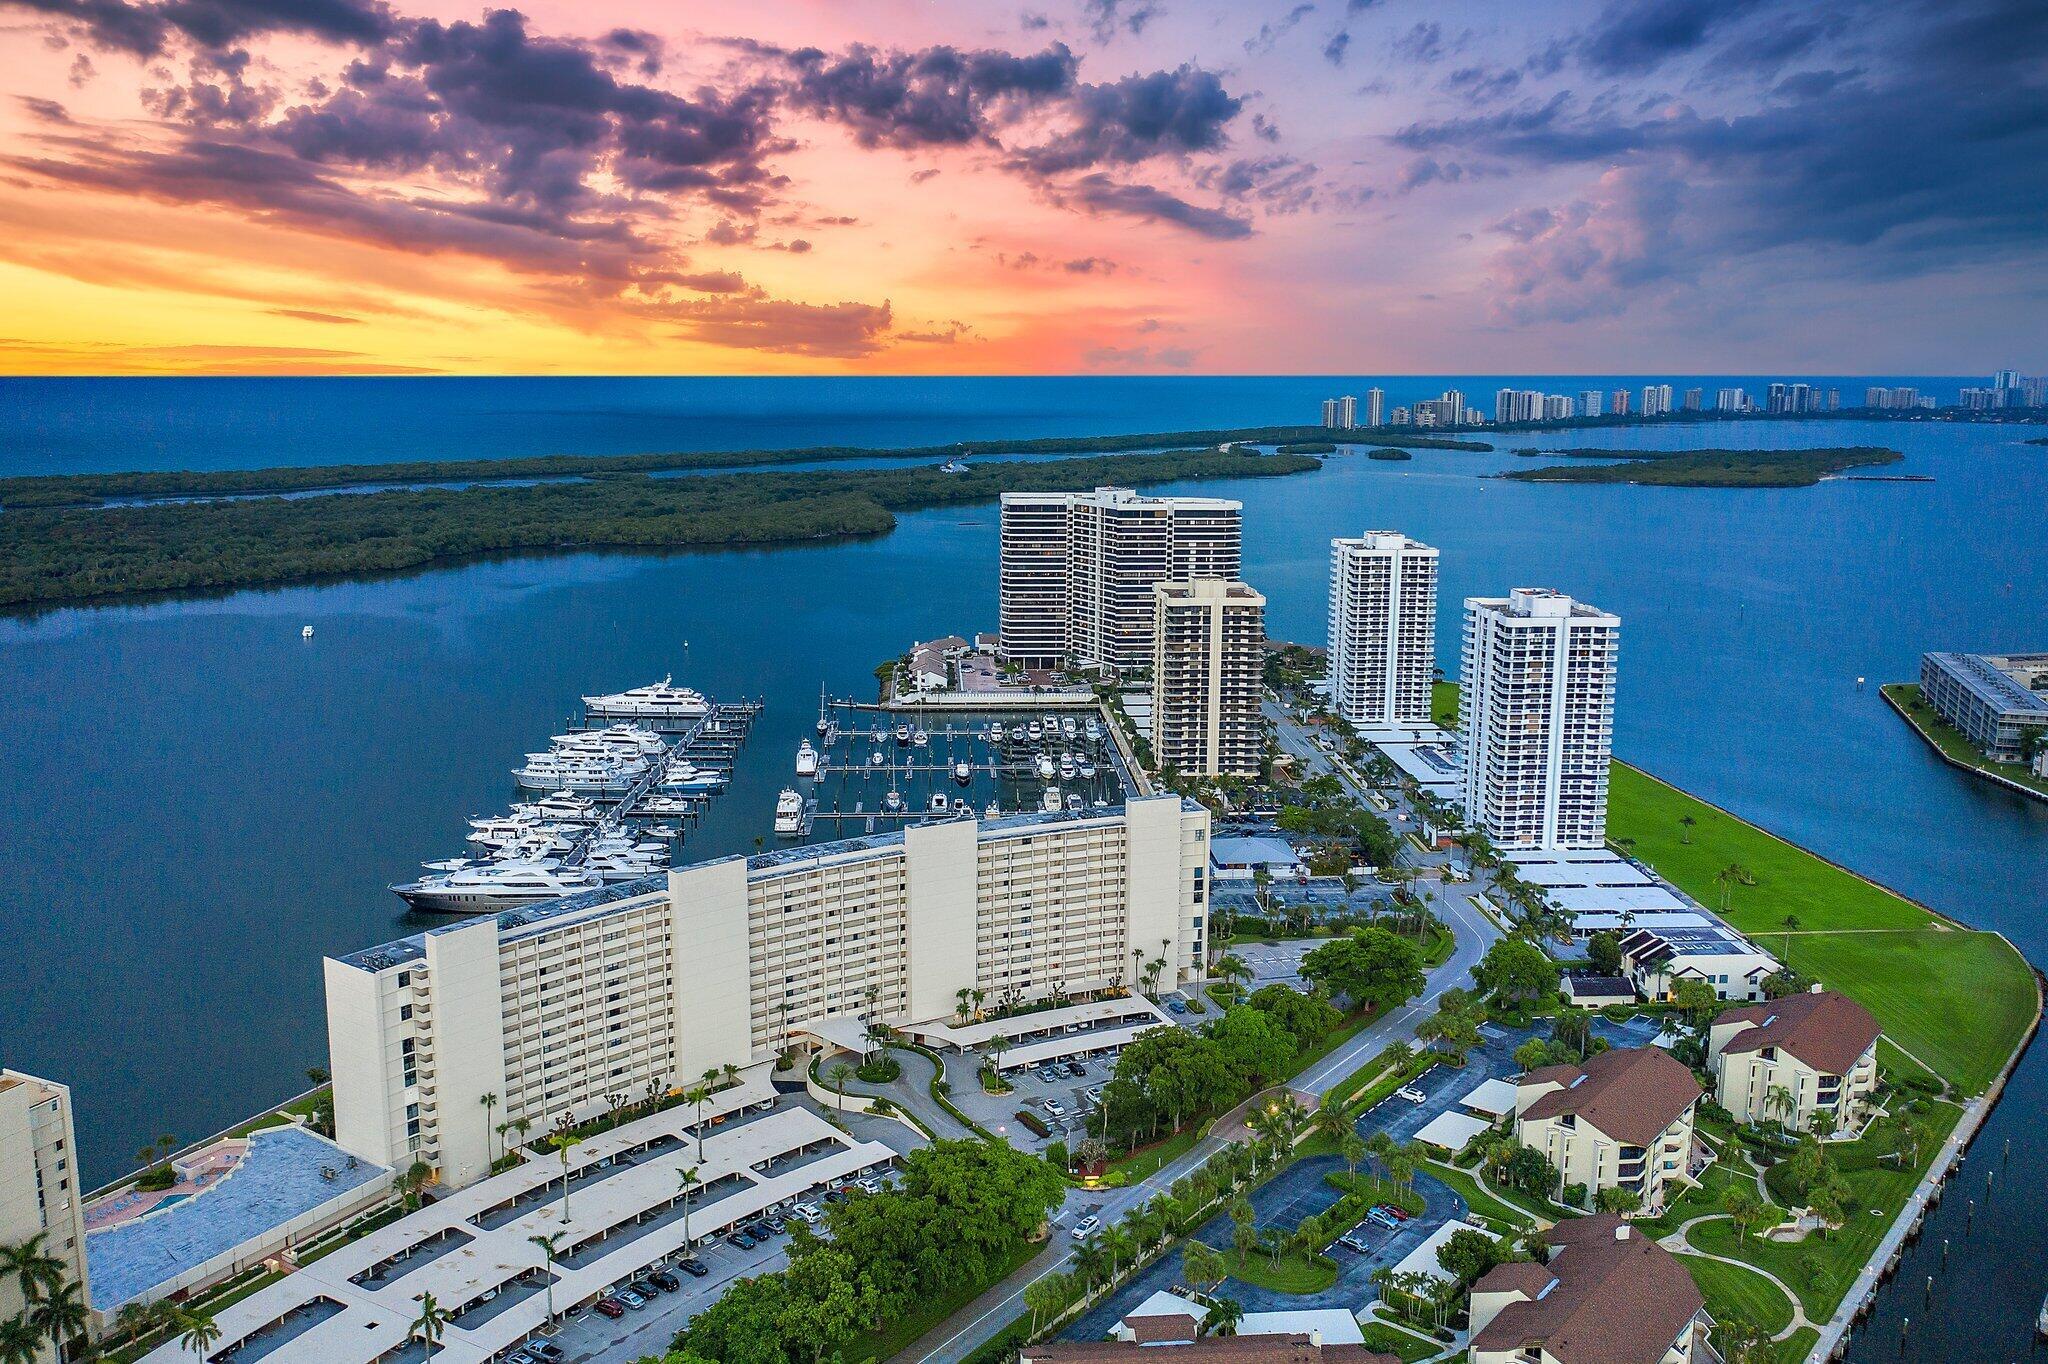 120 Lakeshore Unit 335, North Palm Beach, Florida 33408